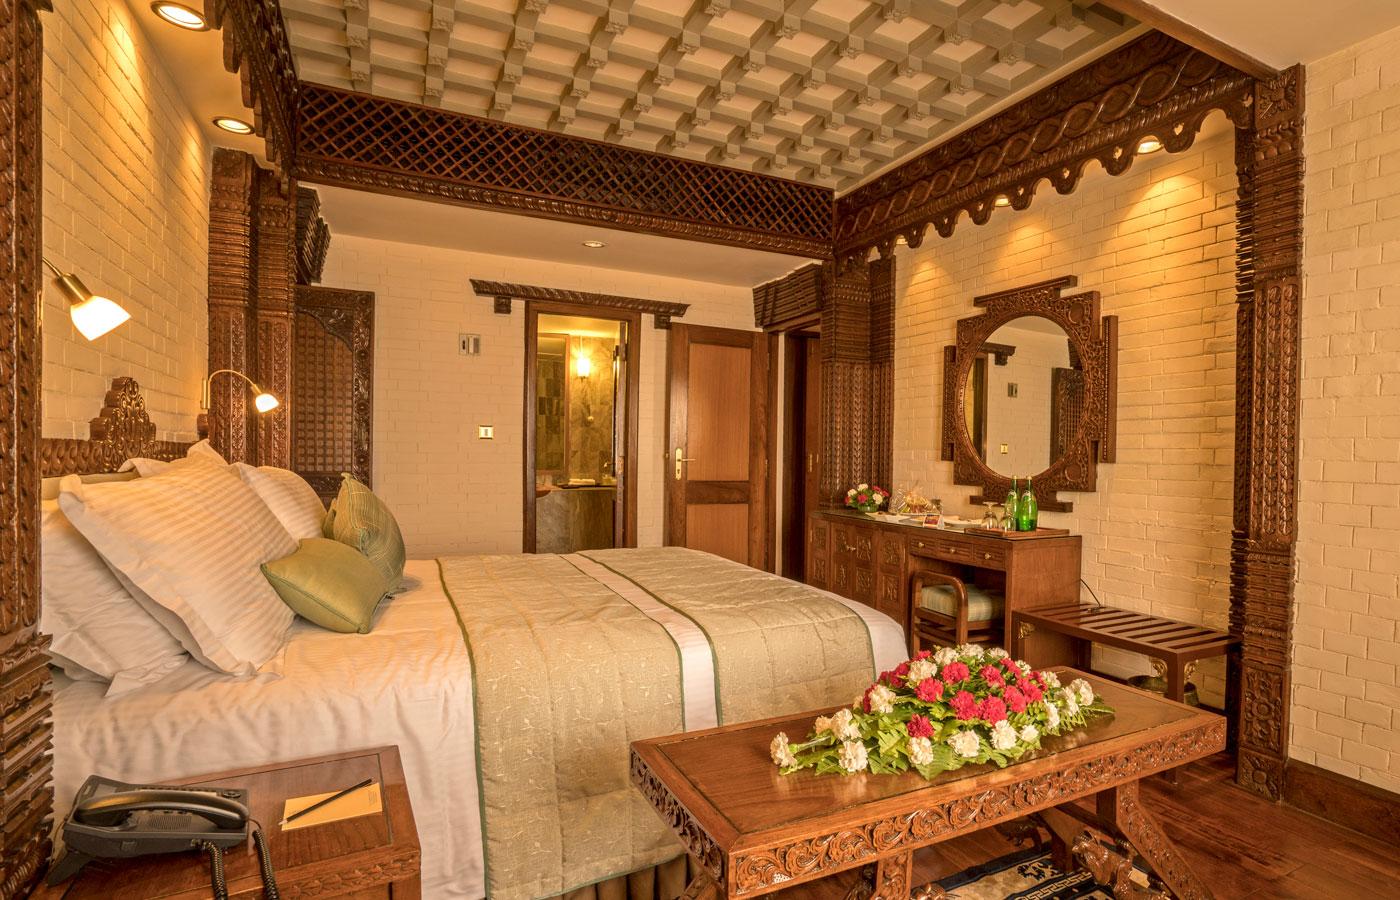 Heritage Deluxe Room  Accommodation  Hotel Yak  Yeti